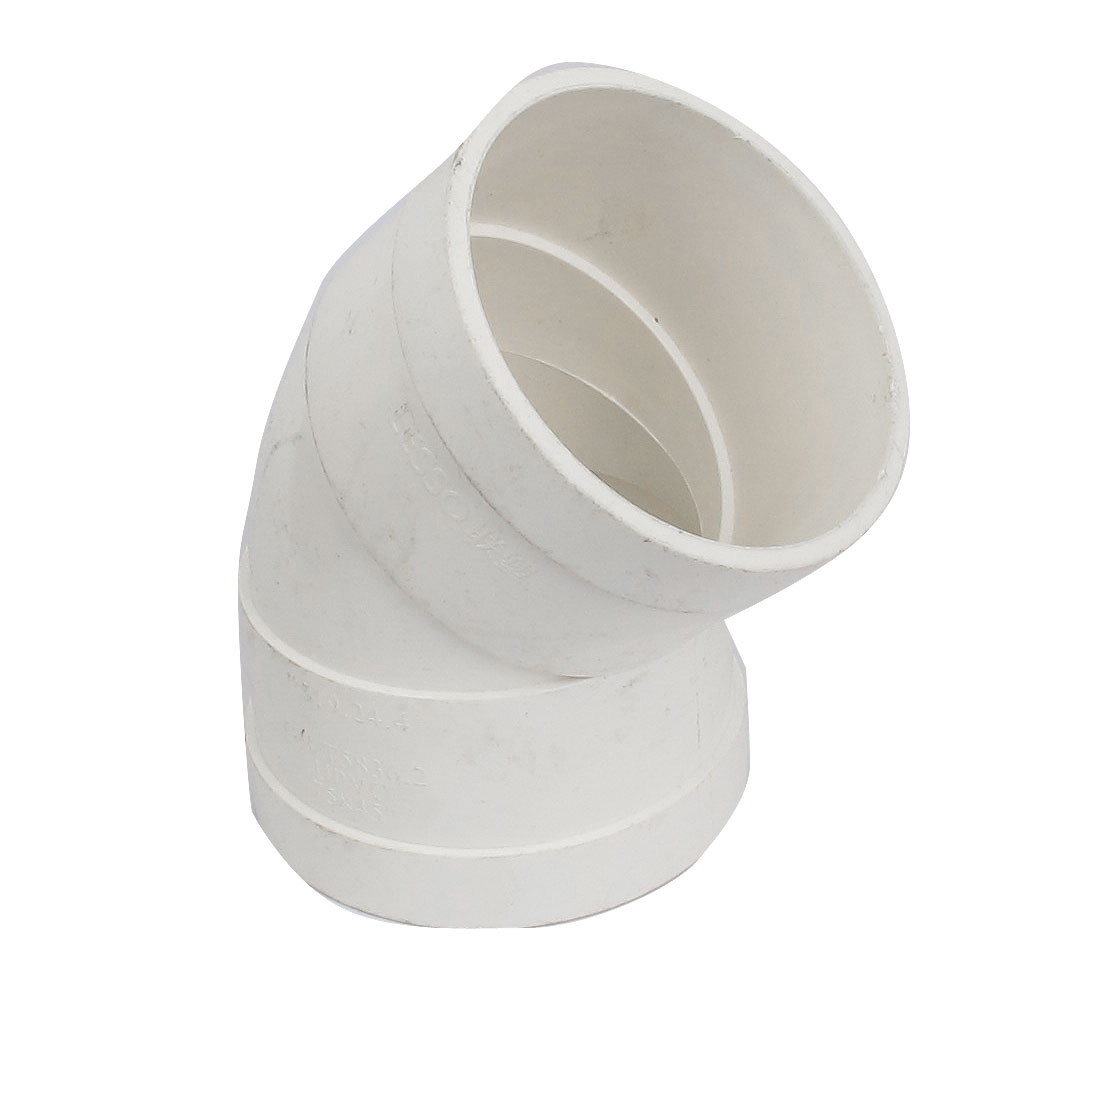 75mm Inner Diameter PVC-U Water Pipe Tube 45 Degree Elbow Design Coupler Connector Fitting